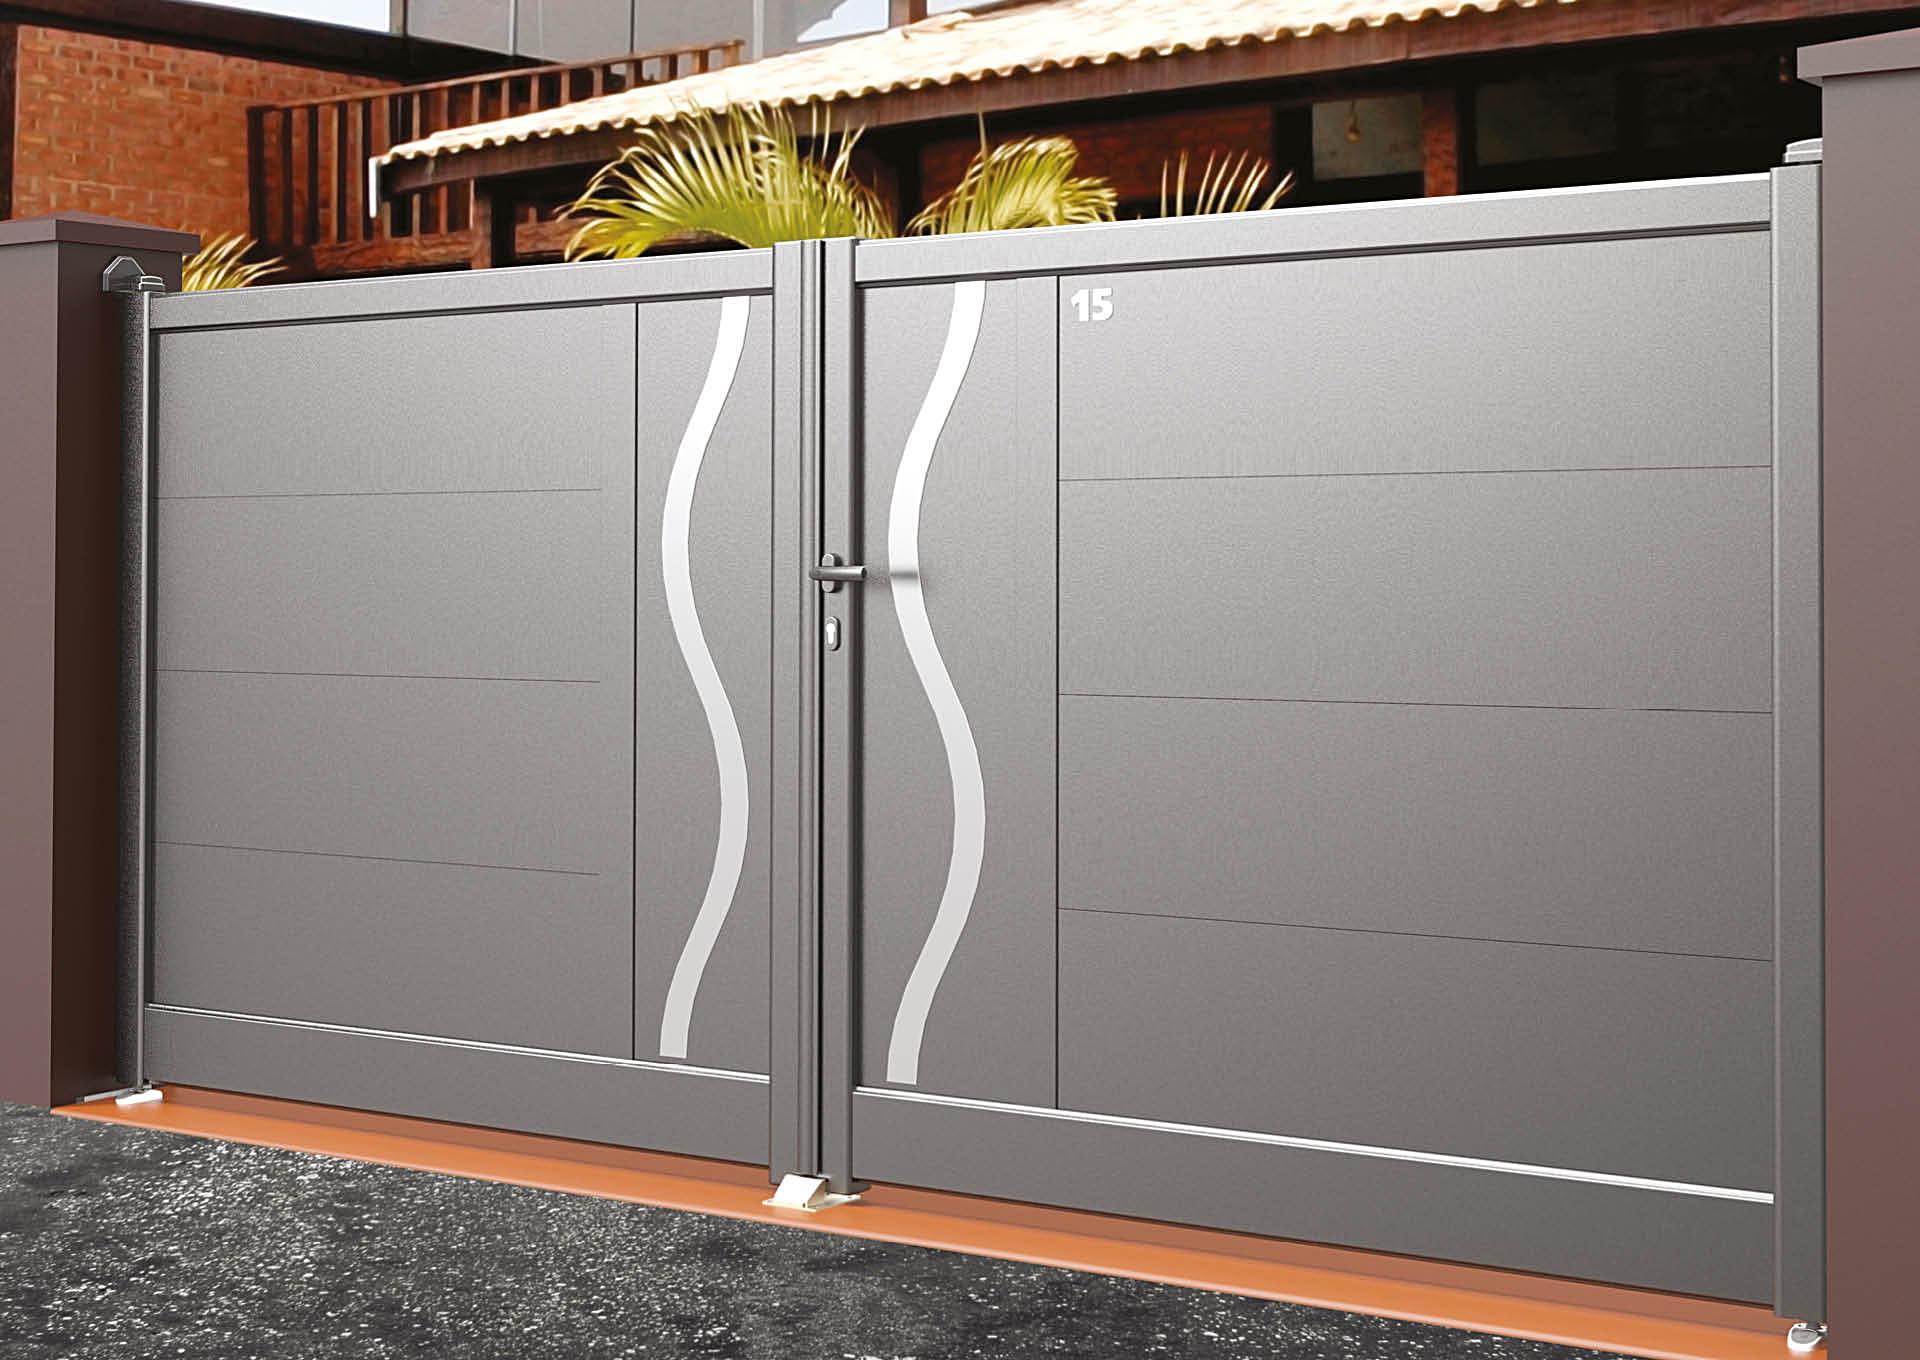 Portail battant en aluminium 9104_B_P3DA Lames horizontales 340mm + décor alu brossé Ondulation